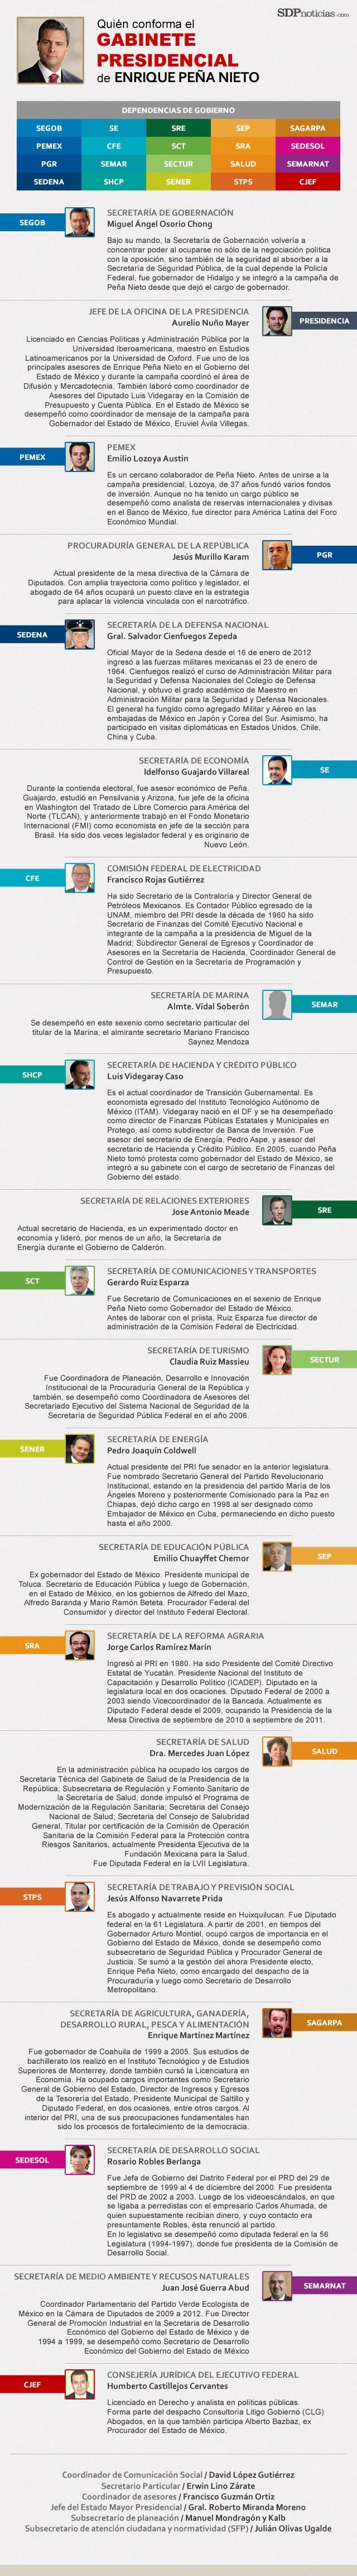 Gabinete de Enrique Pena Nieto #infografia #infographics #penanieto #politica #presidente #pri